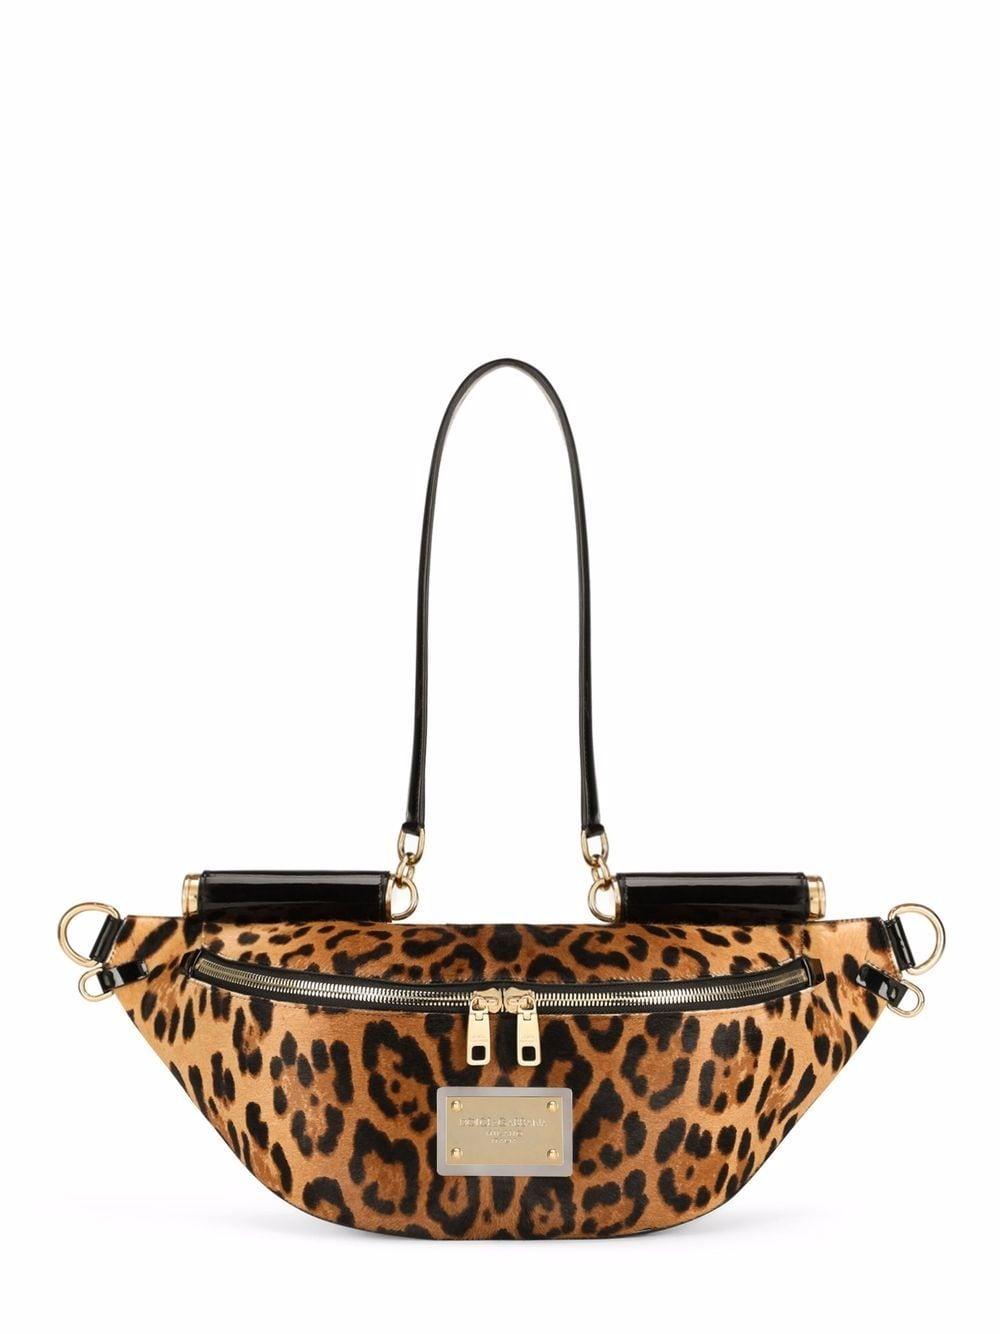 Dolce & Gabbana leopard-print belt bag - Braun